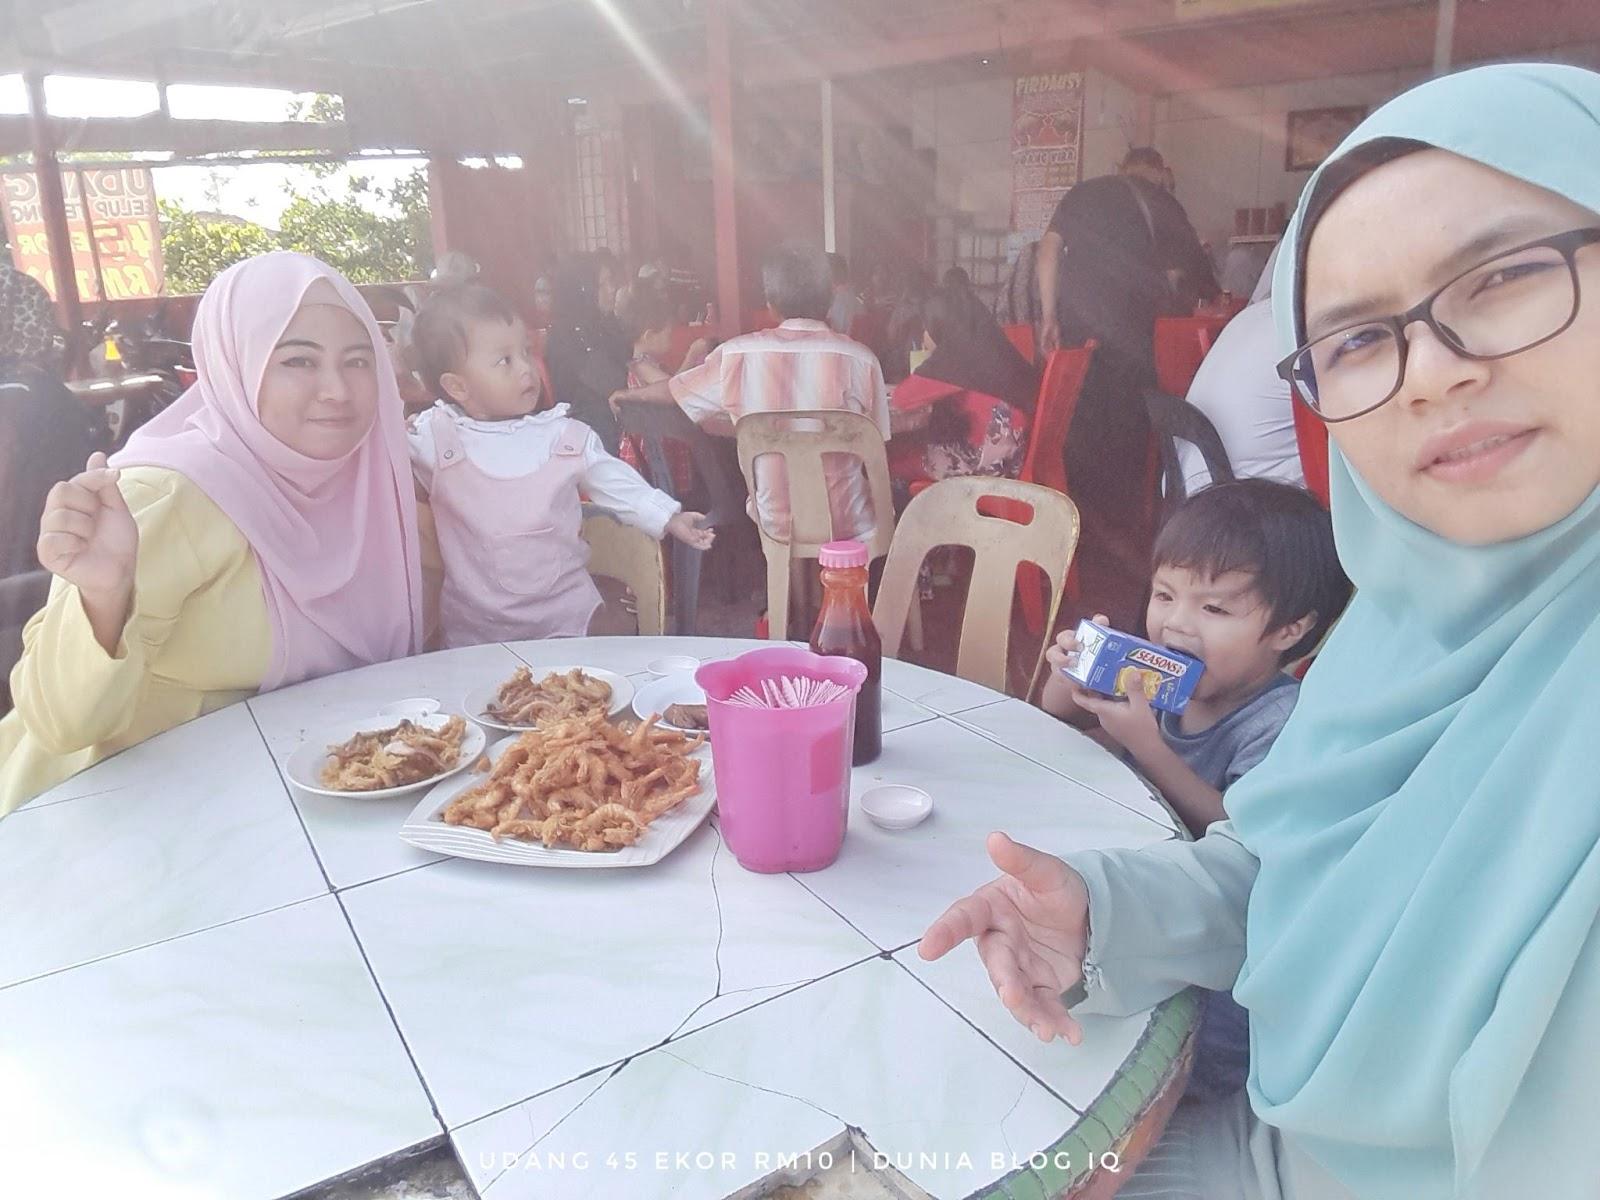 Udang Viral 45 Ekor RM10 di Firdausy Seafood Corner, Tok Jembal, Kuala Terengganu